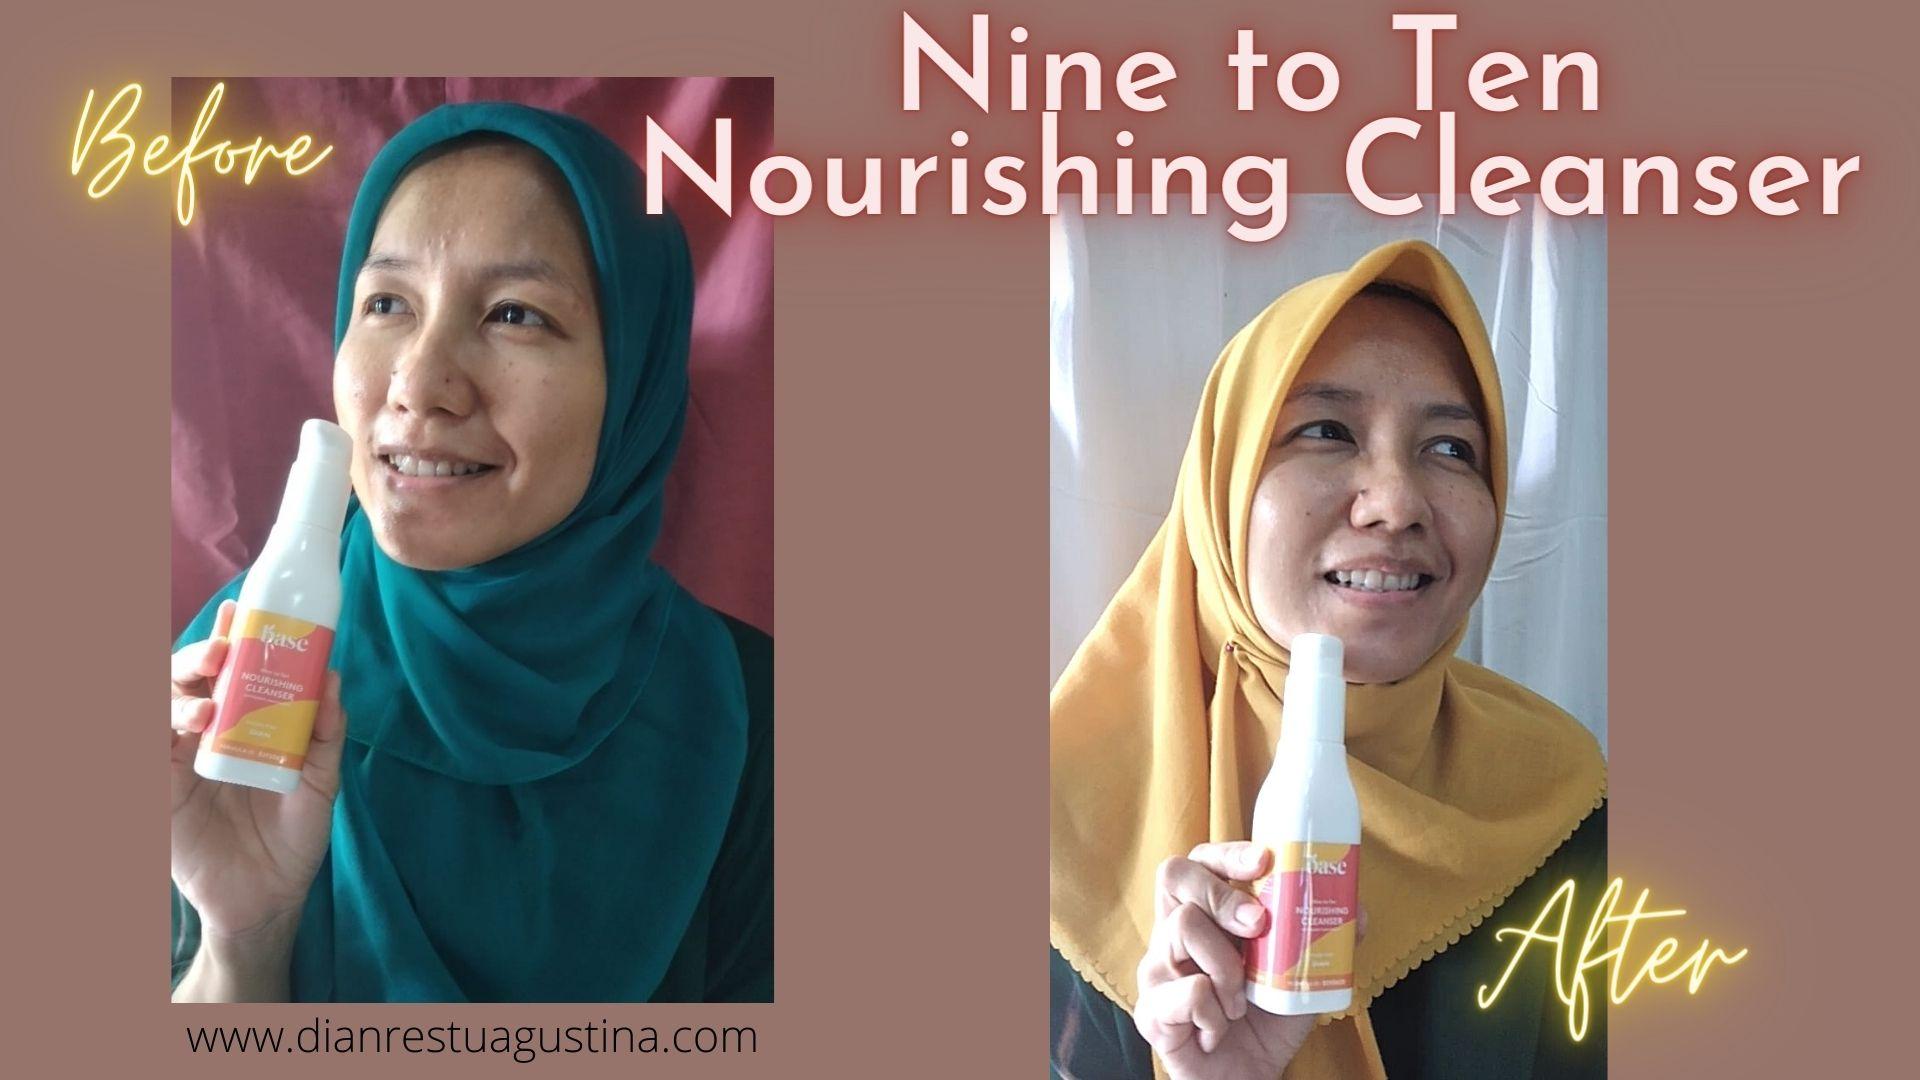 Review Nine to Ten Nourishing Cleanser BASE